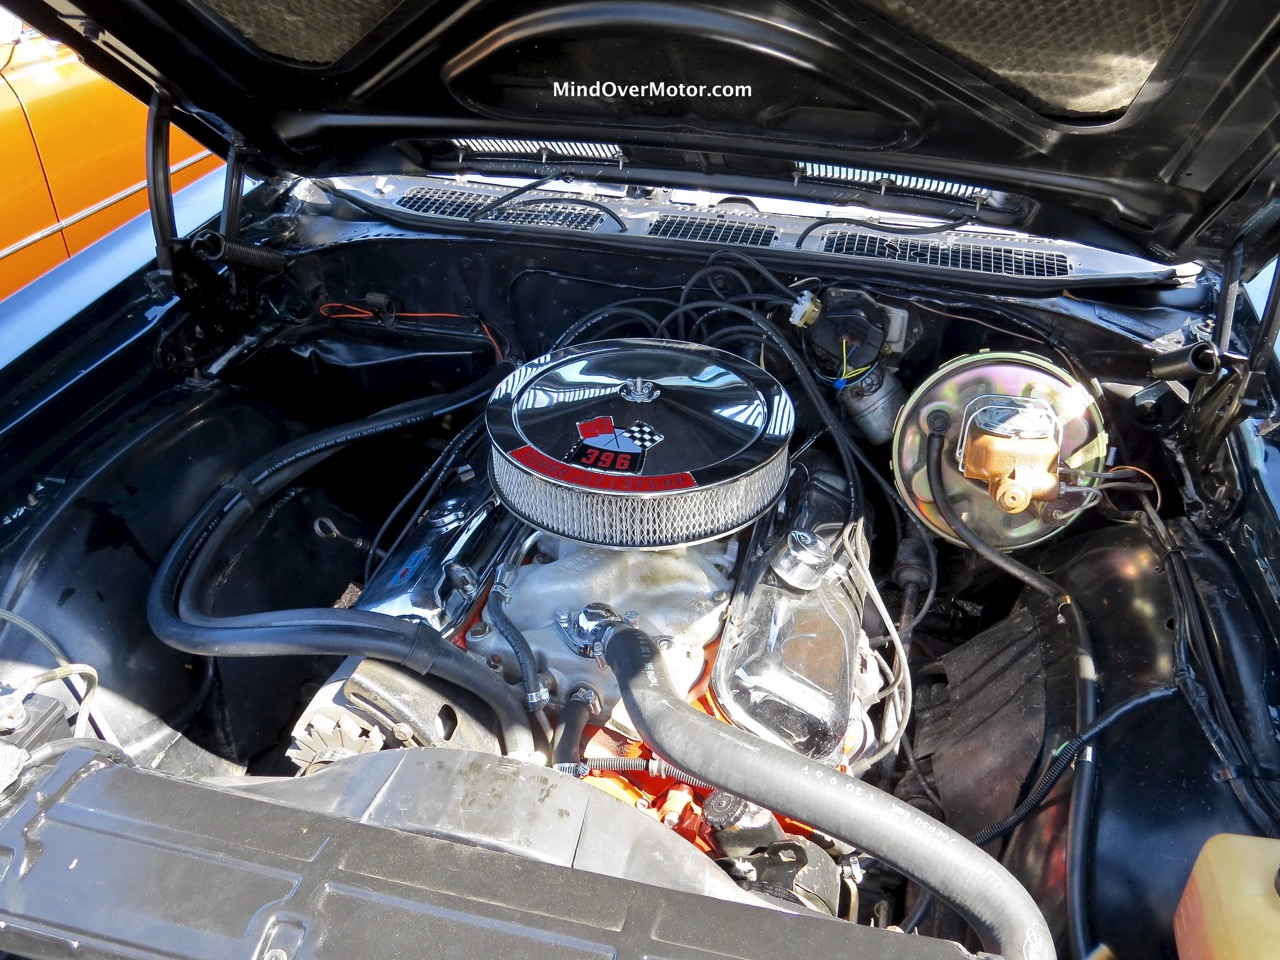 1968 Chevrolet Chevelle SS396 Engine